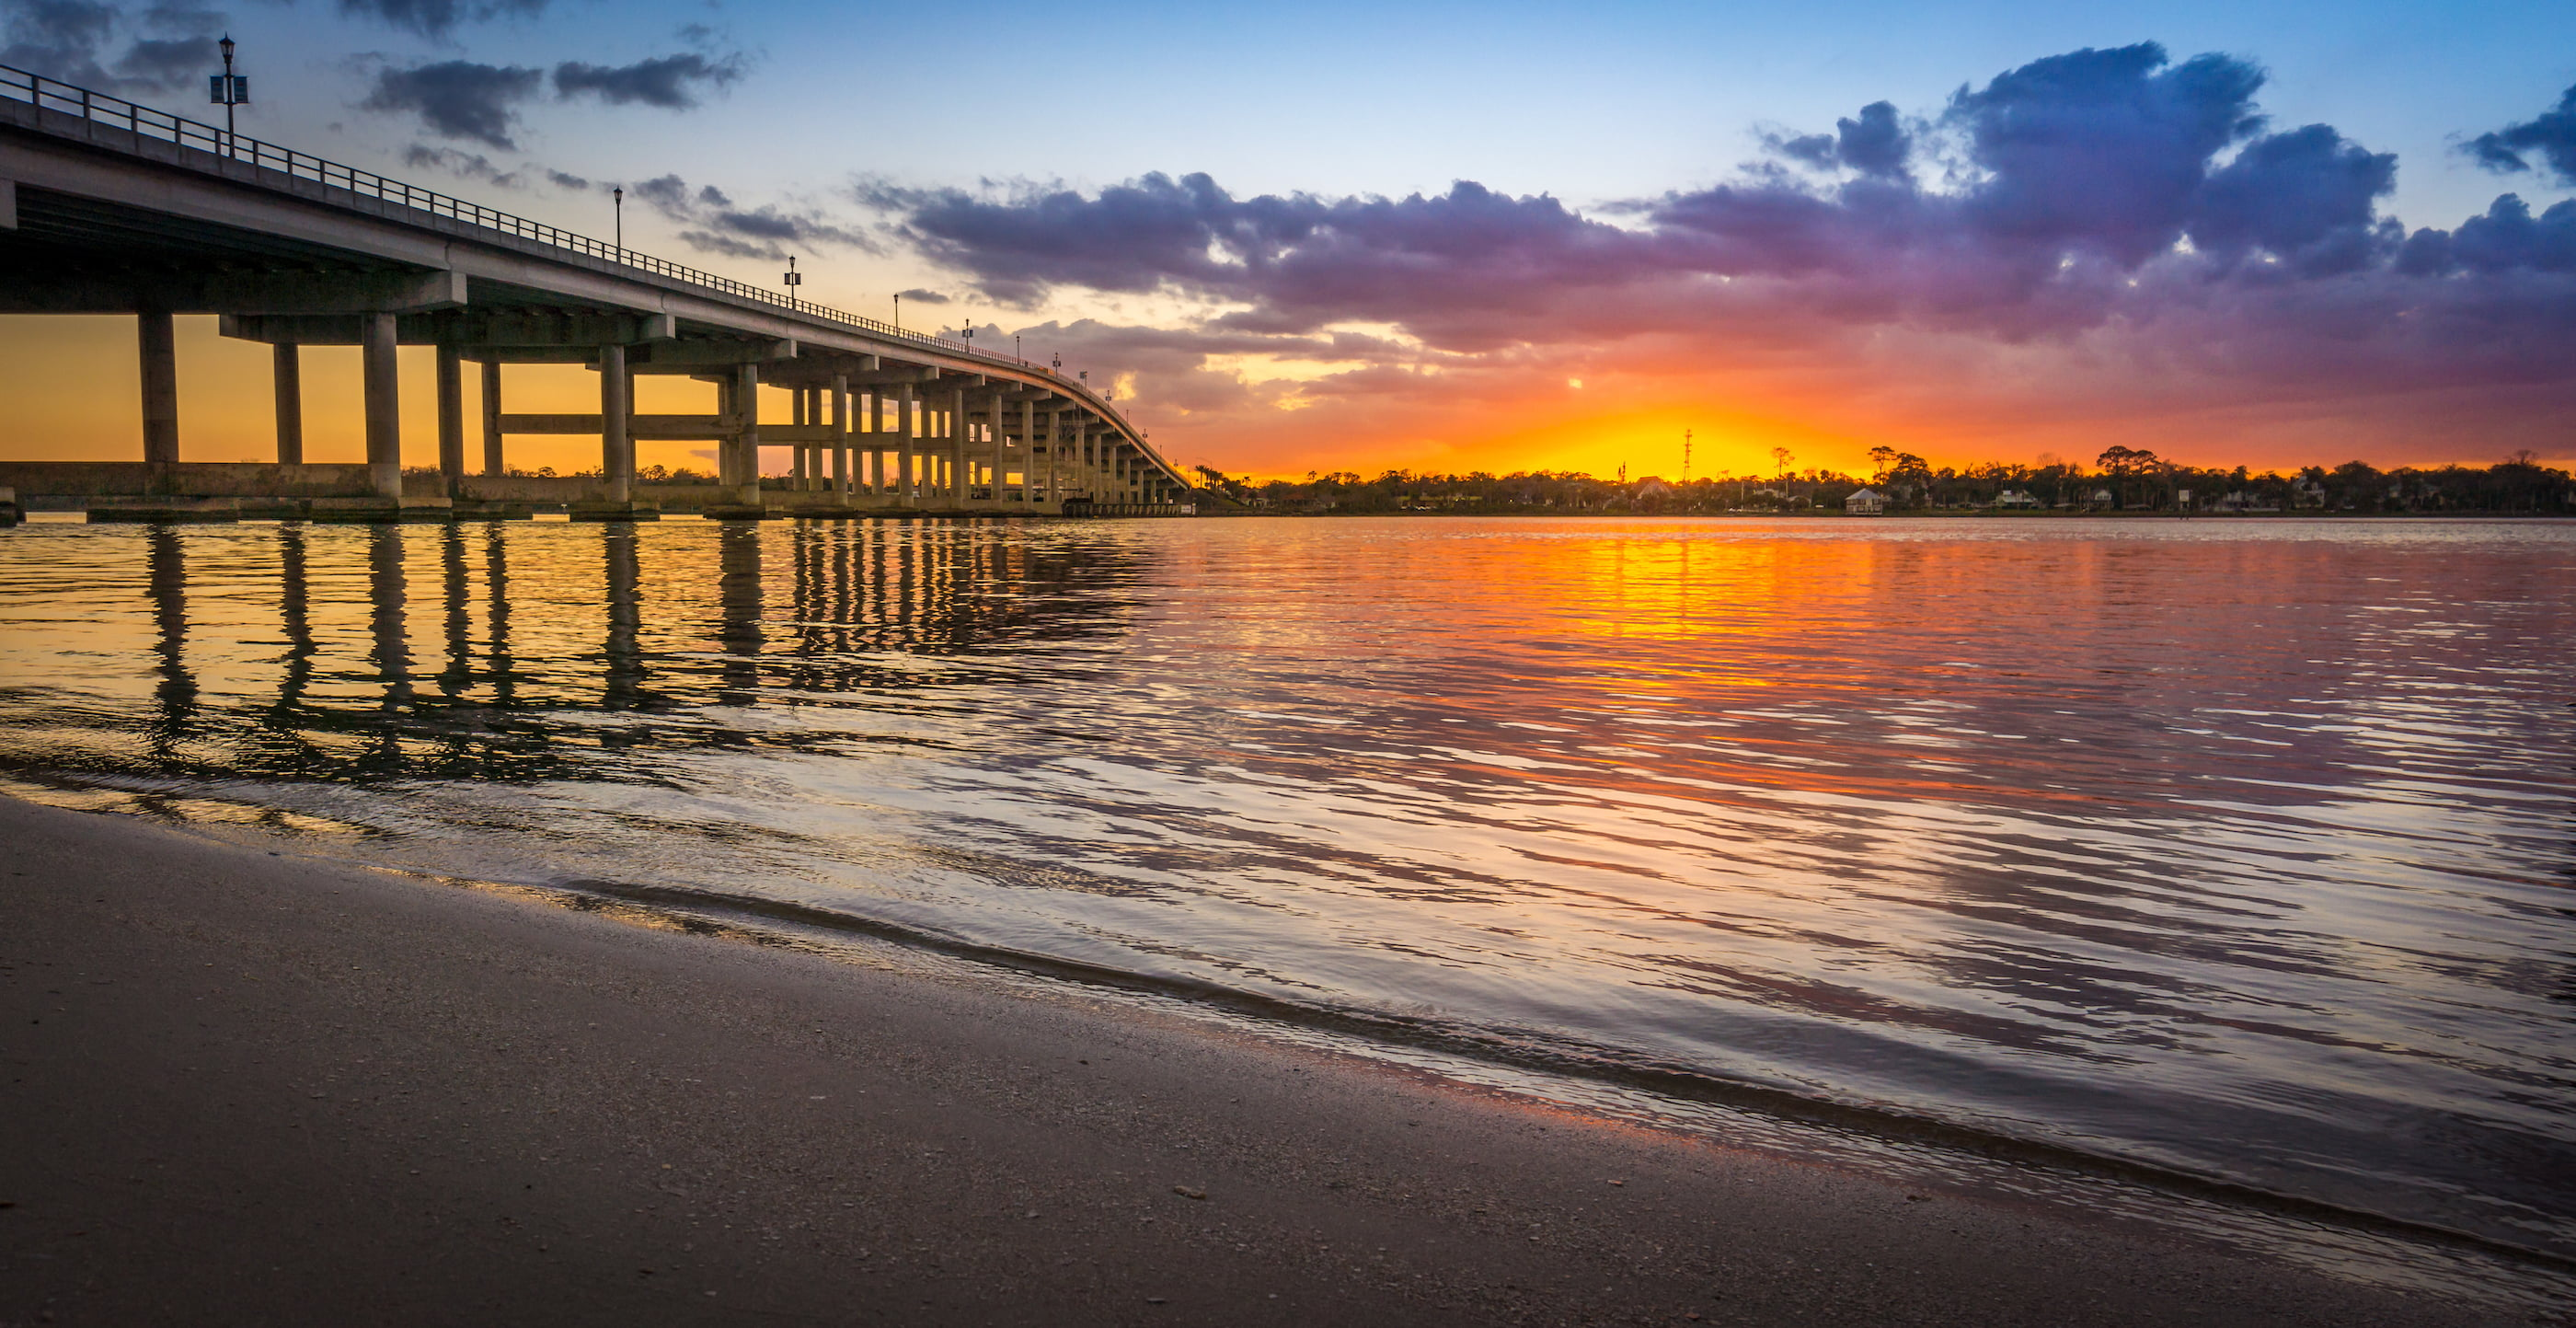 Florida Bridge into the Sunset